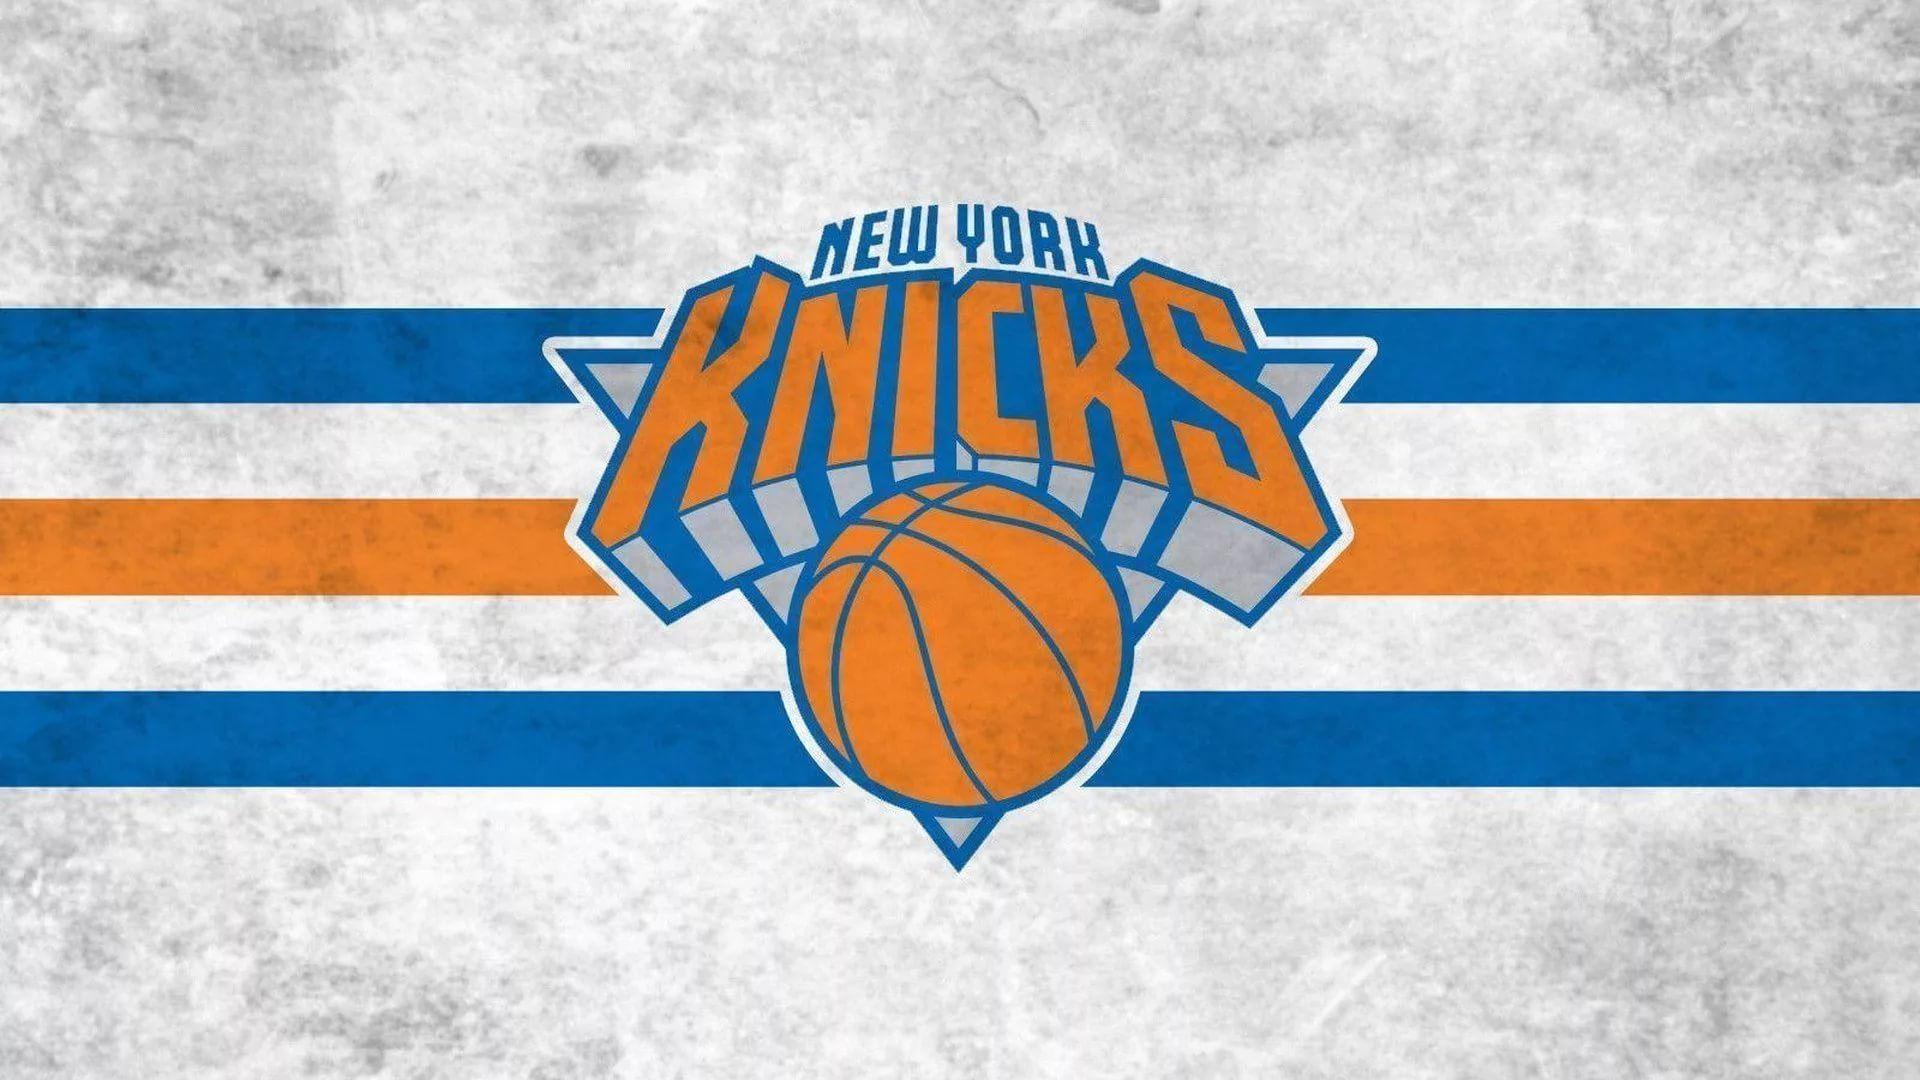 New York Knicks download free wallpaper image search